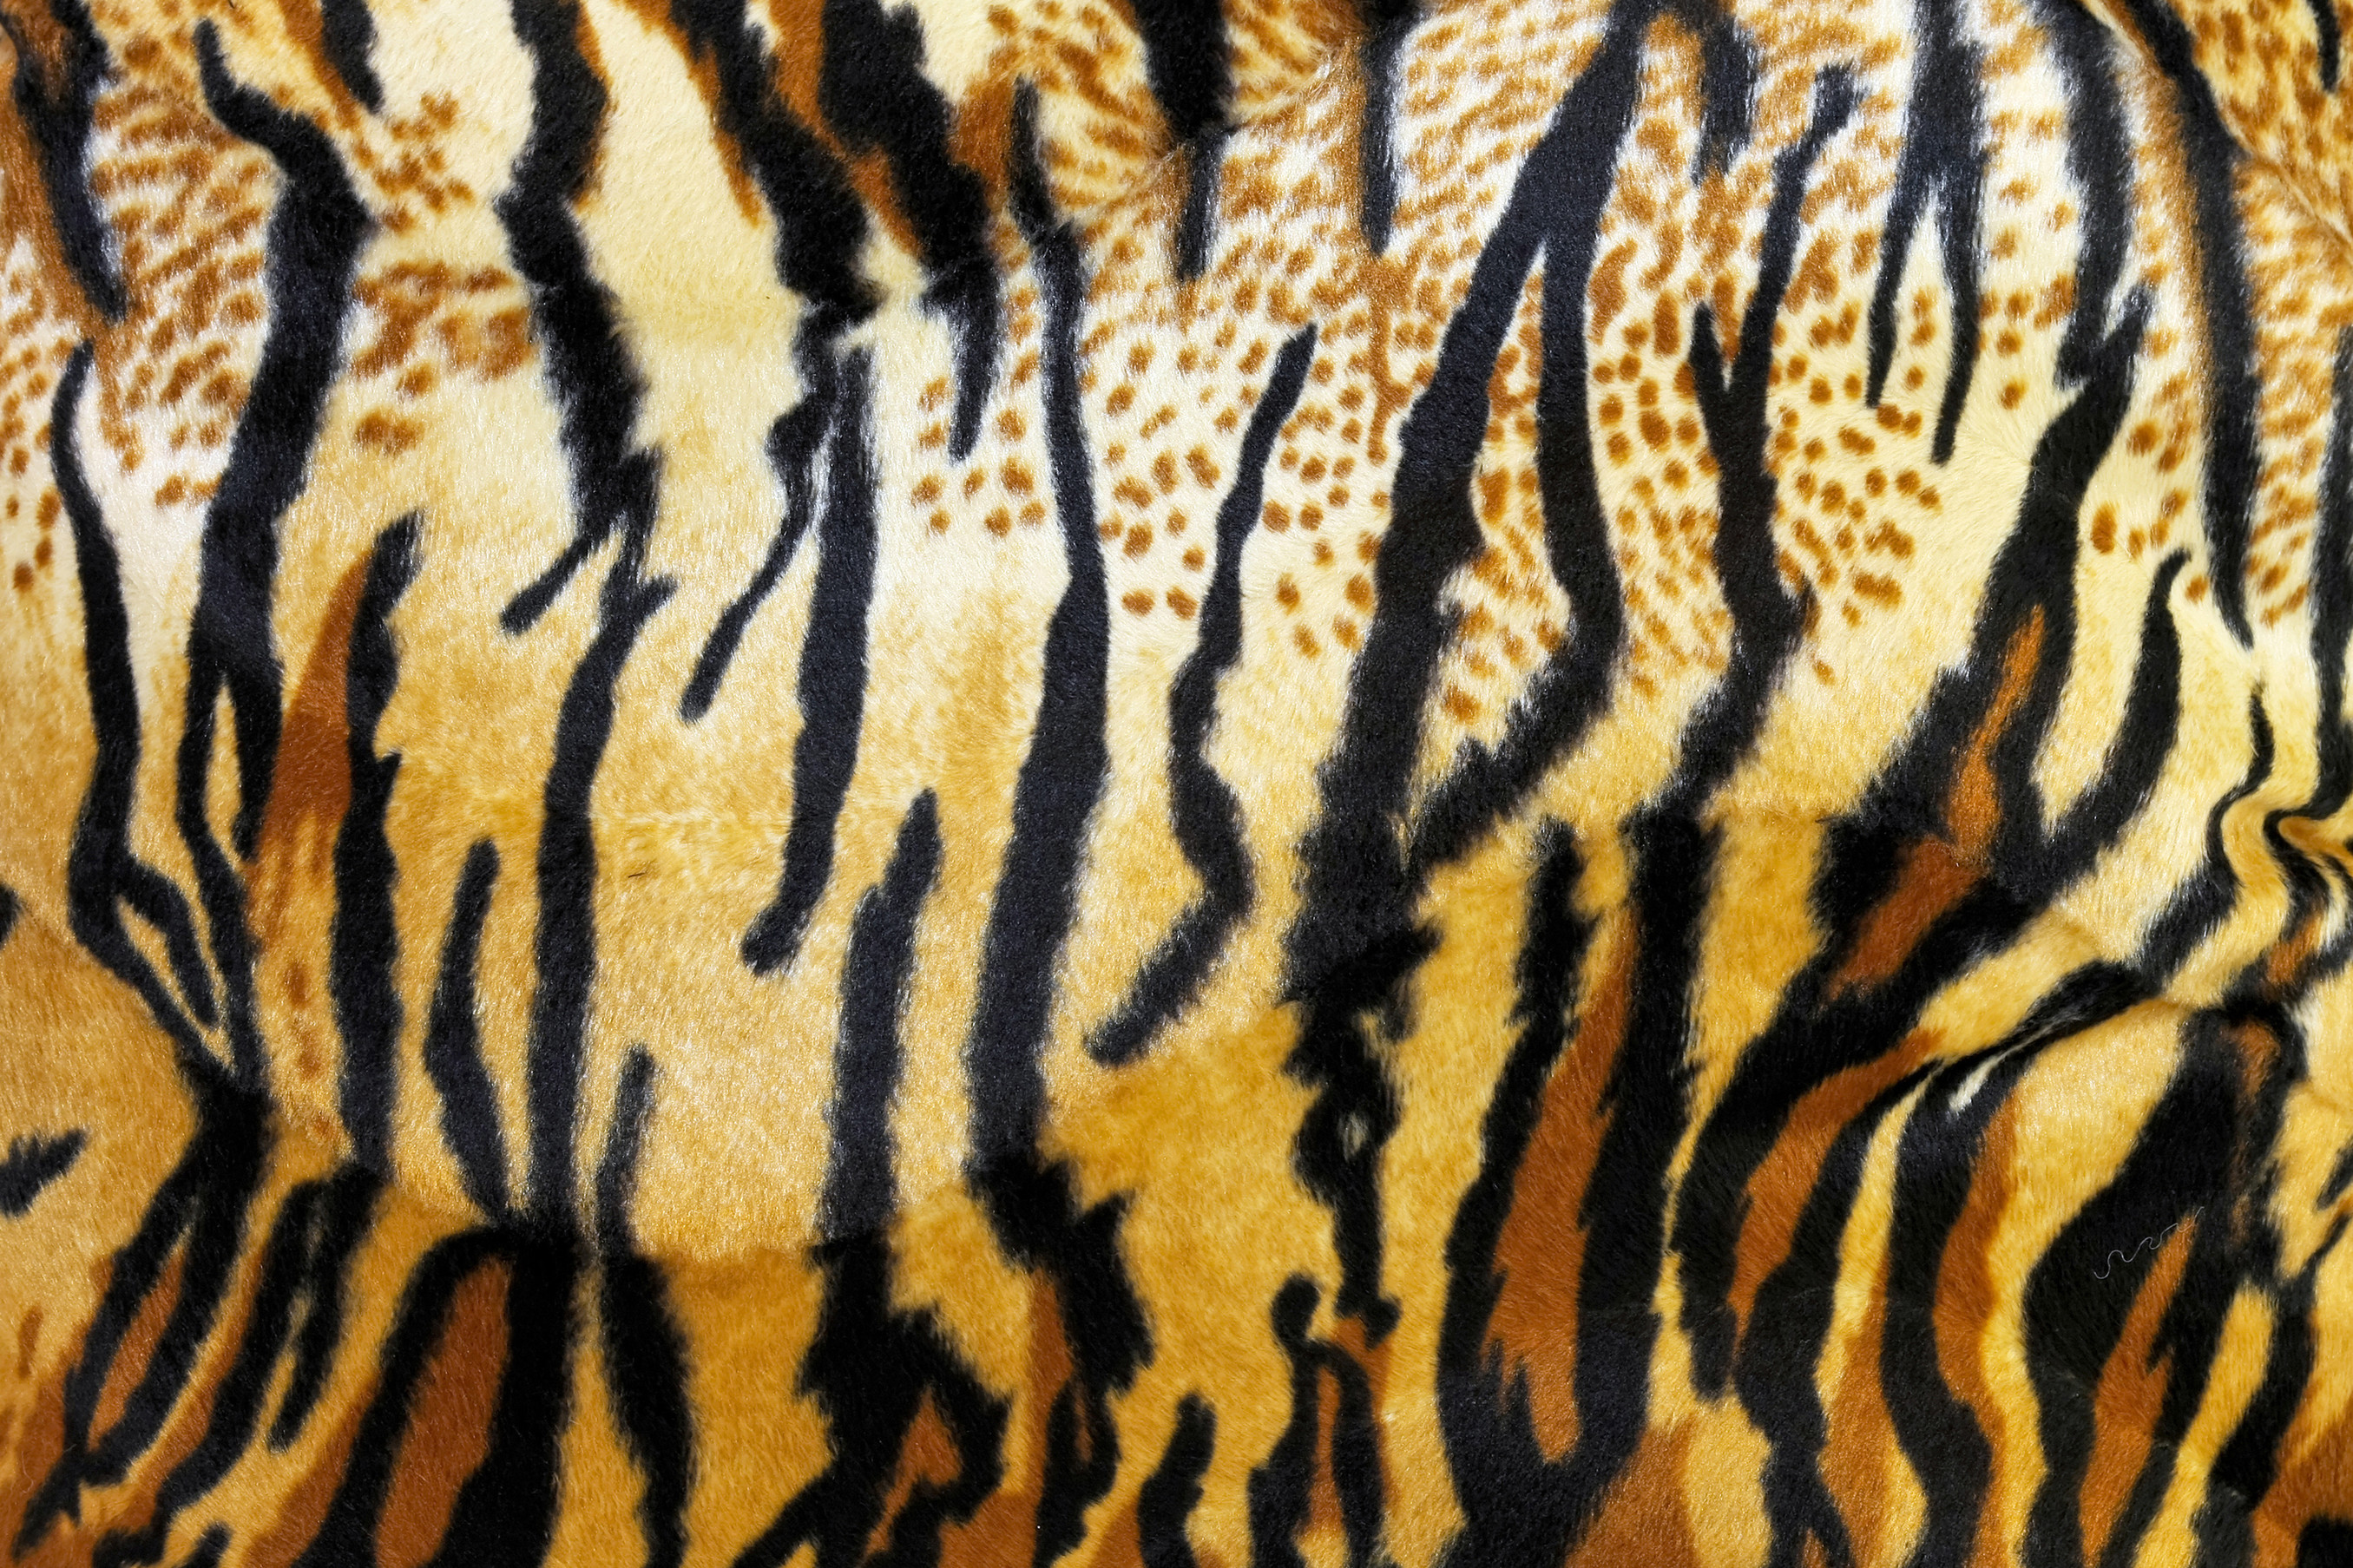 шкура тигра, фото, скачать